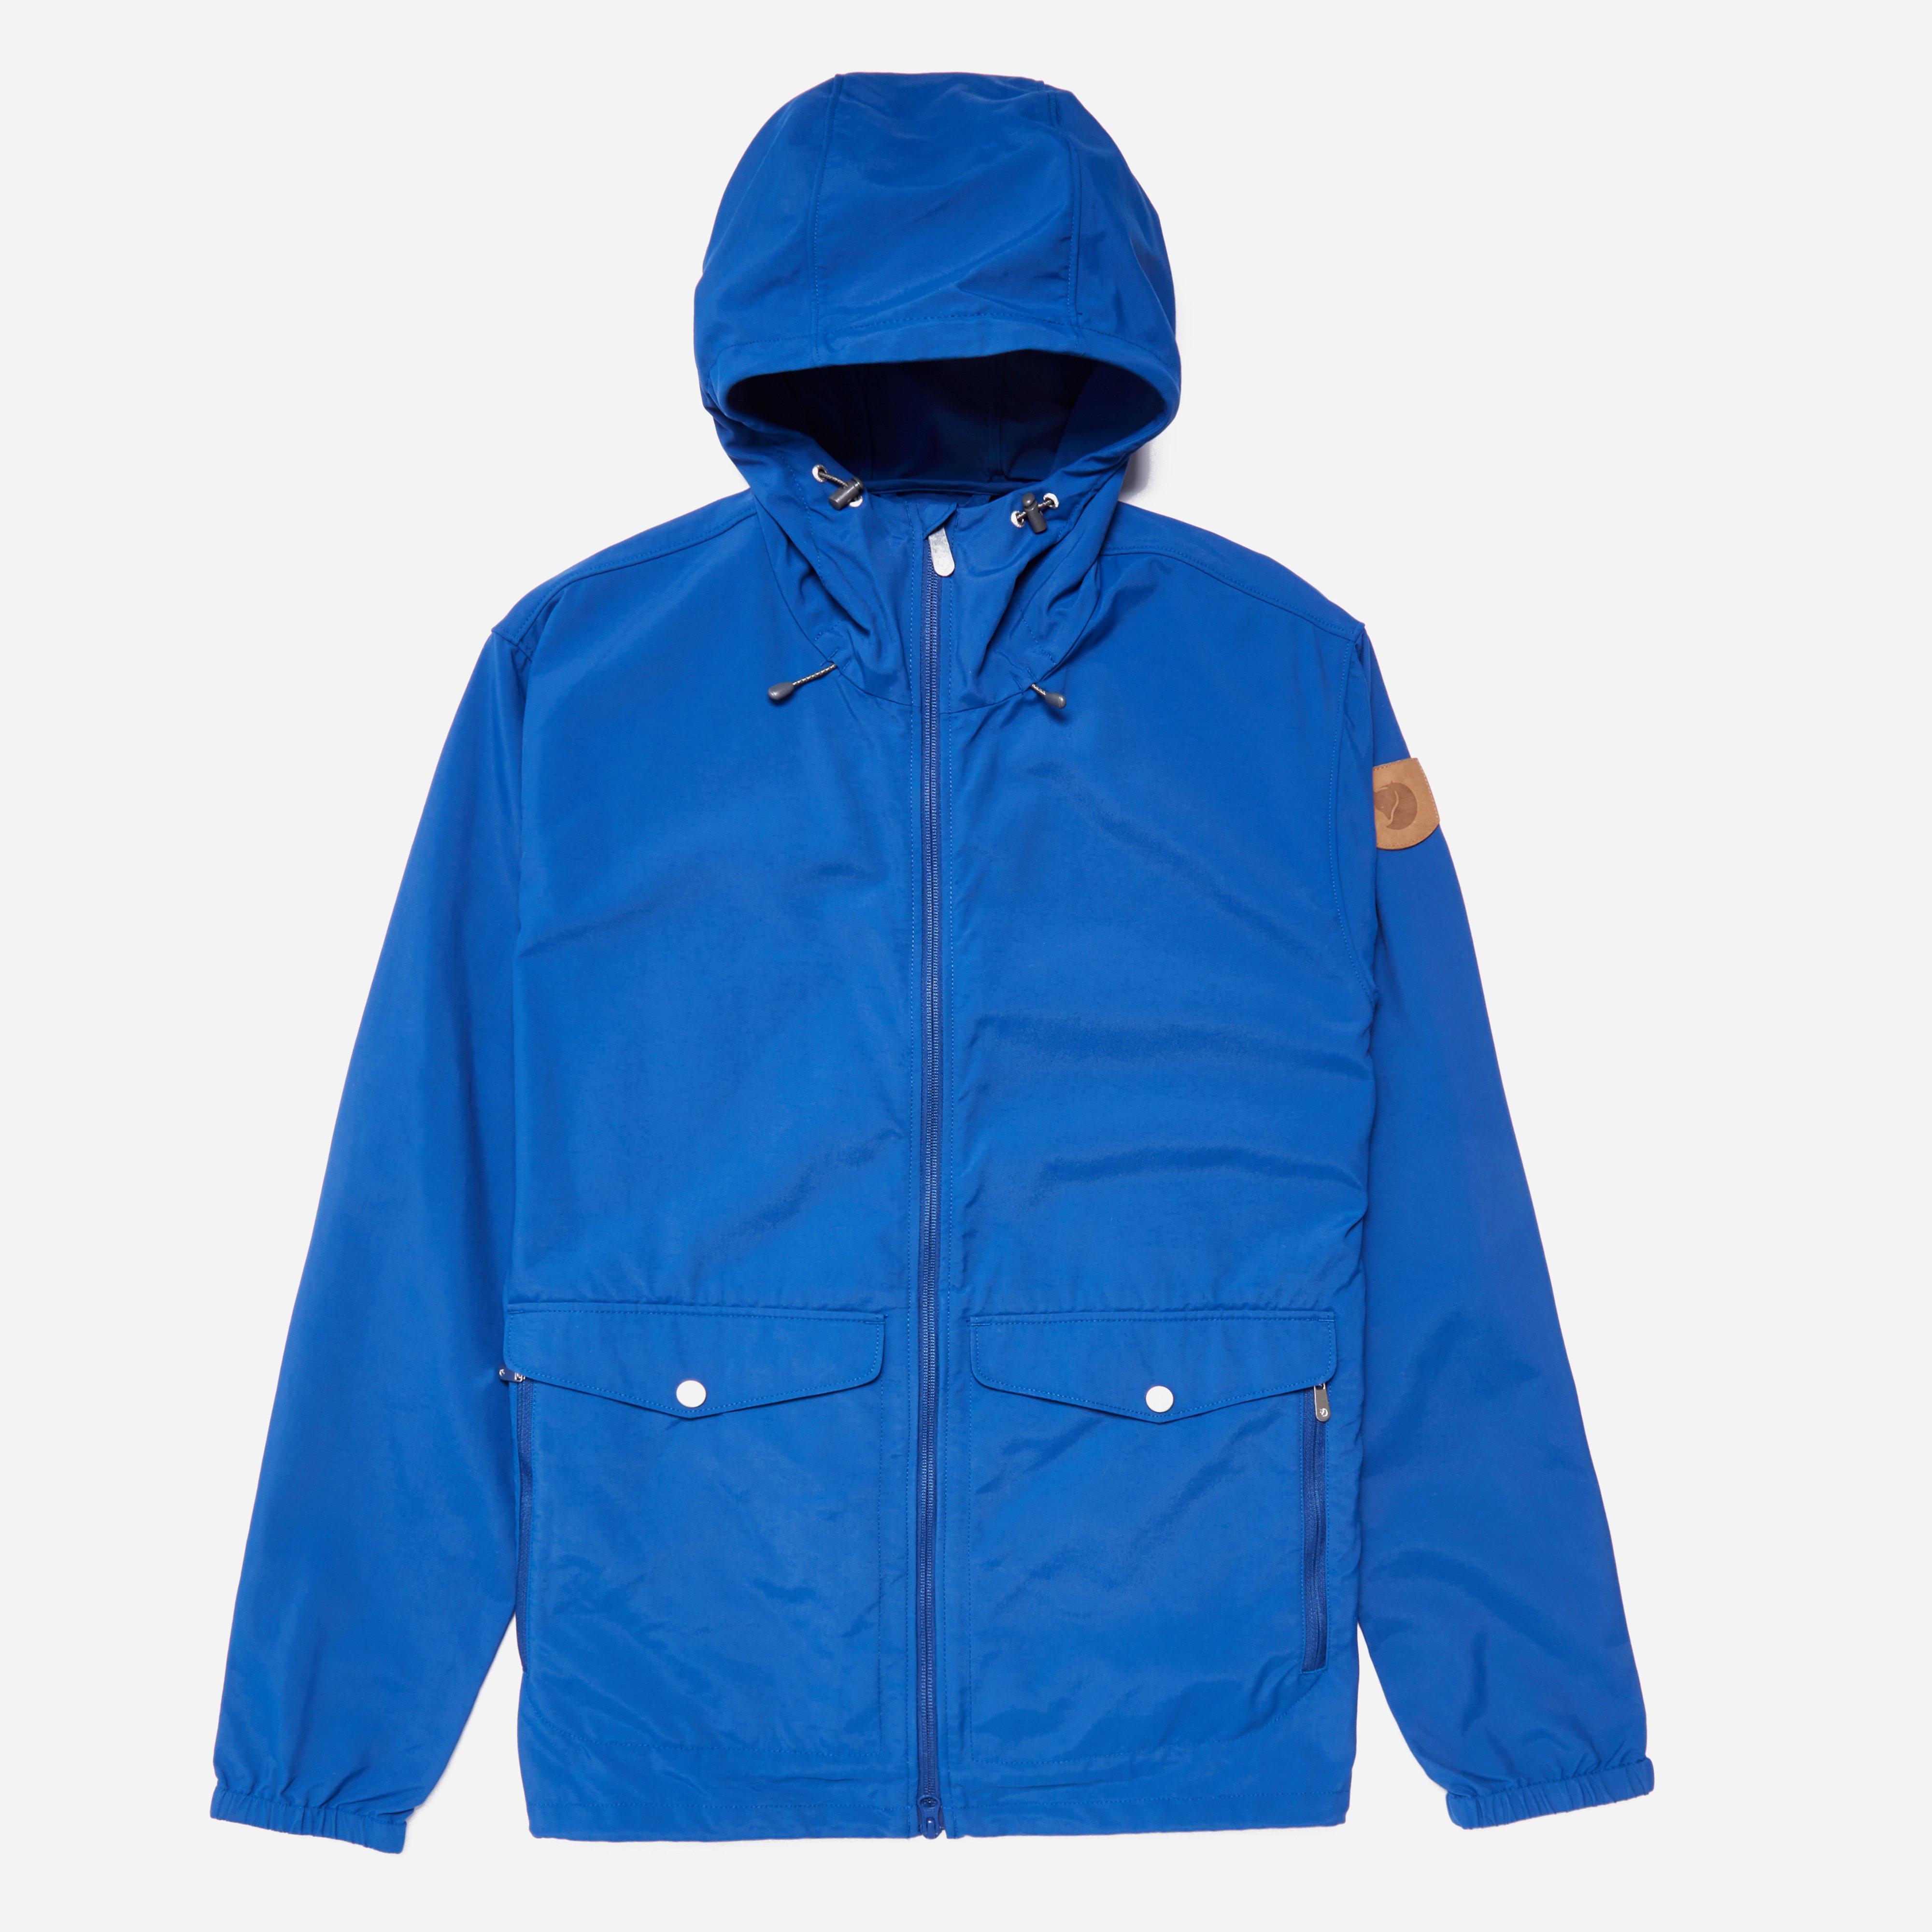 Fjallraven Greenland Wind Jacket